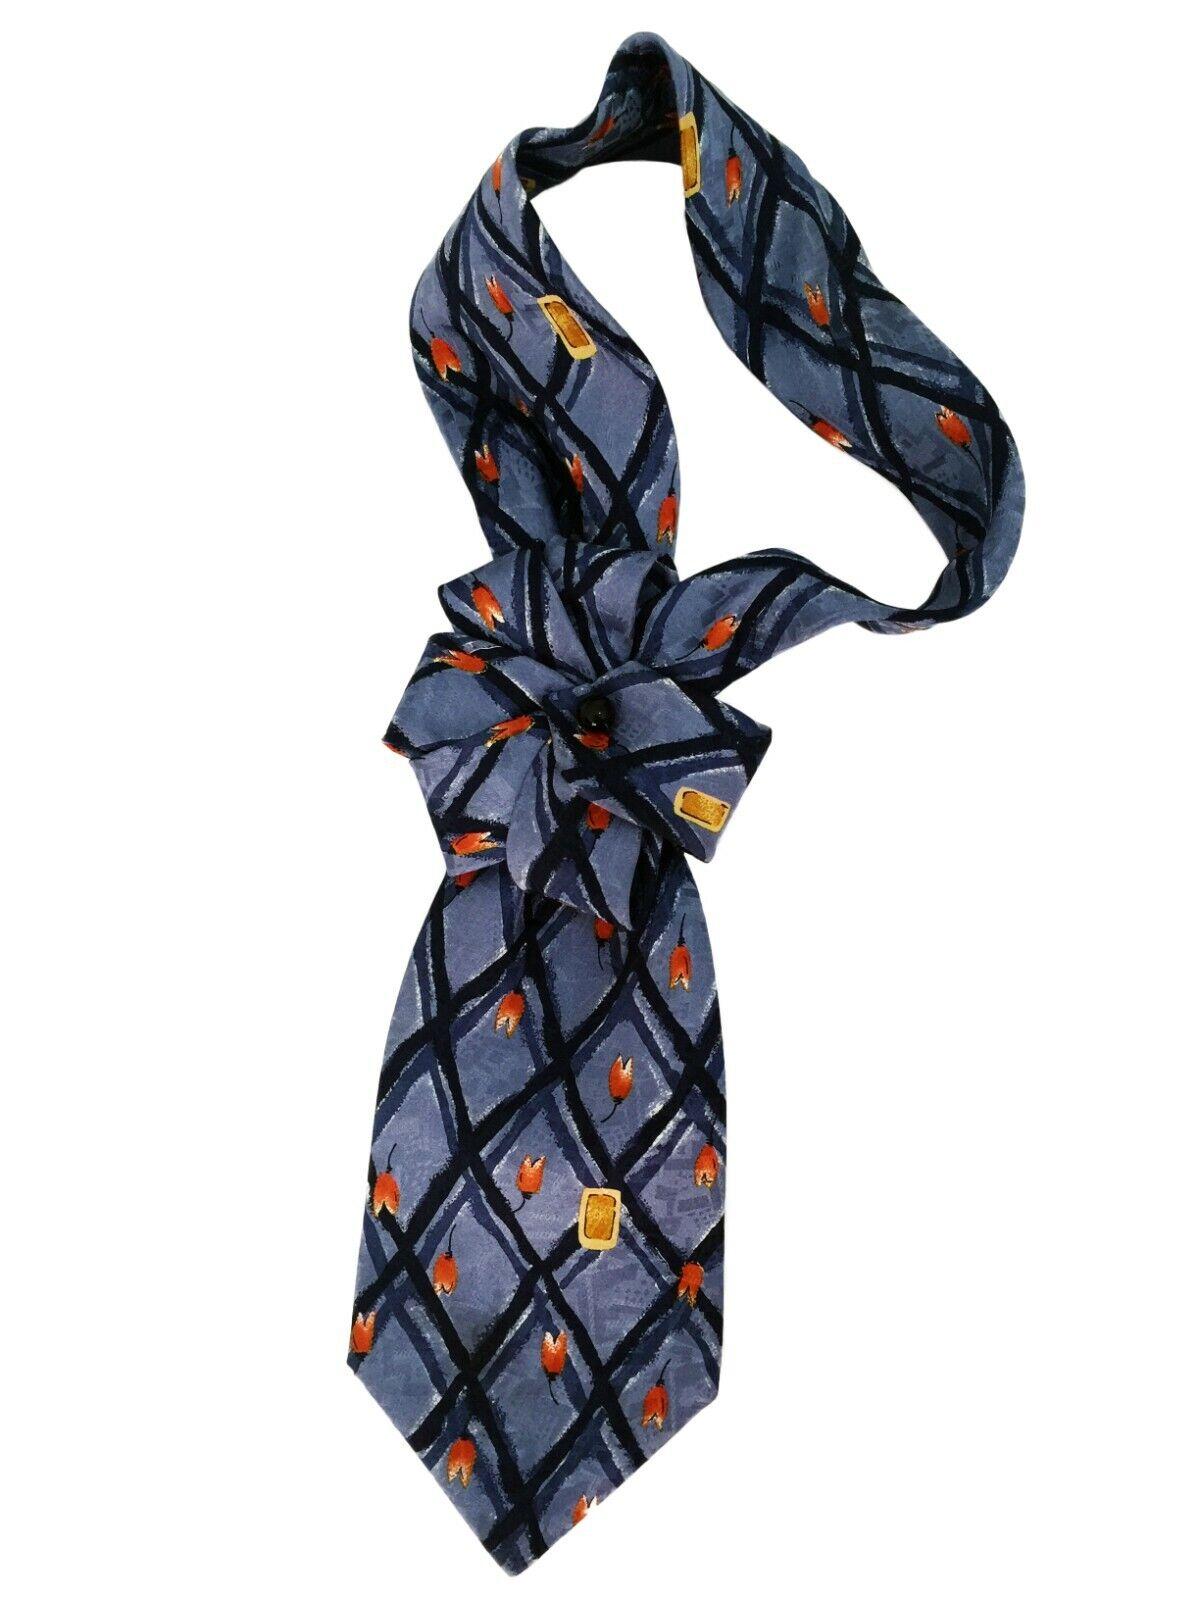 Tie women's Silk 100% Italy. Collar necklace necktie cravat Hand-made brooch